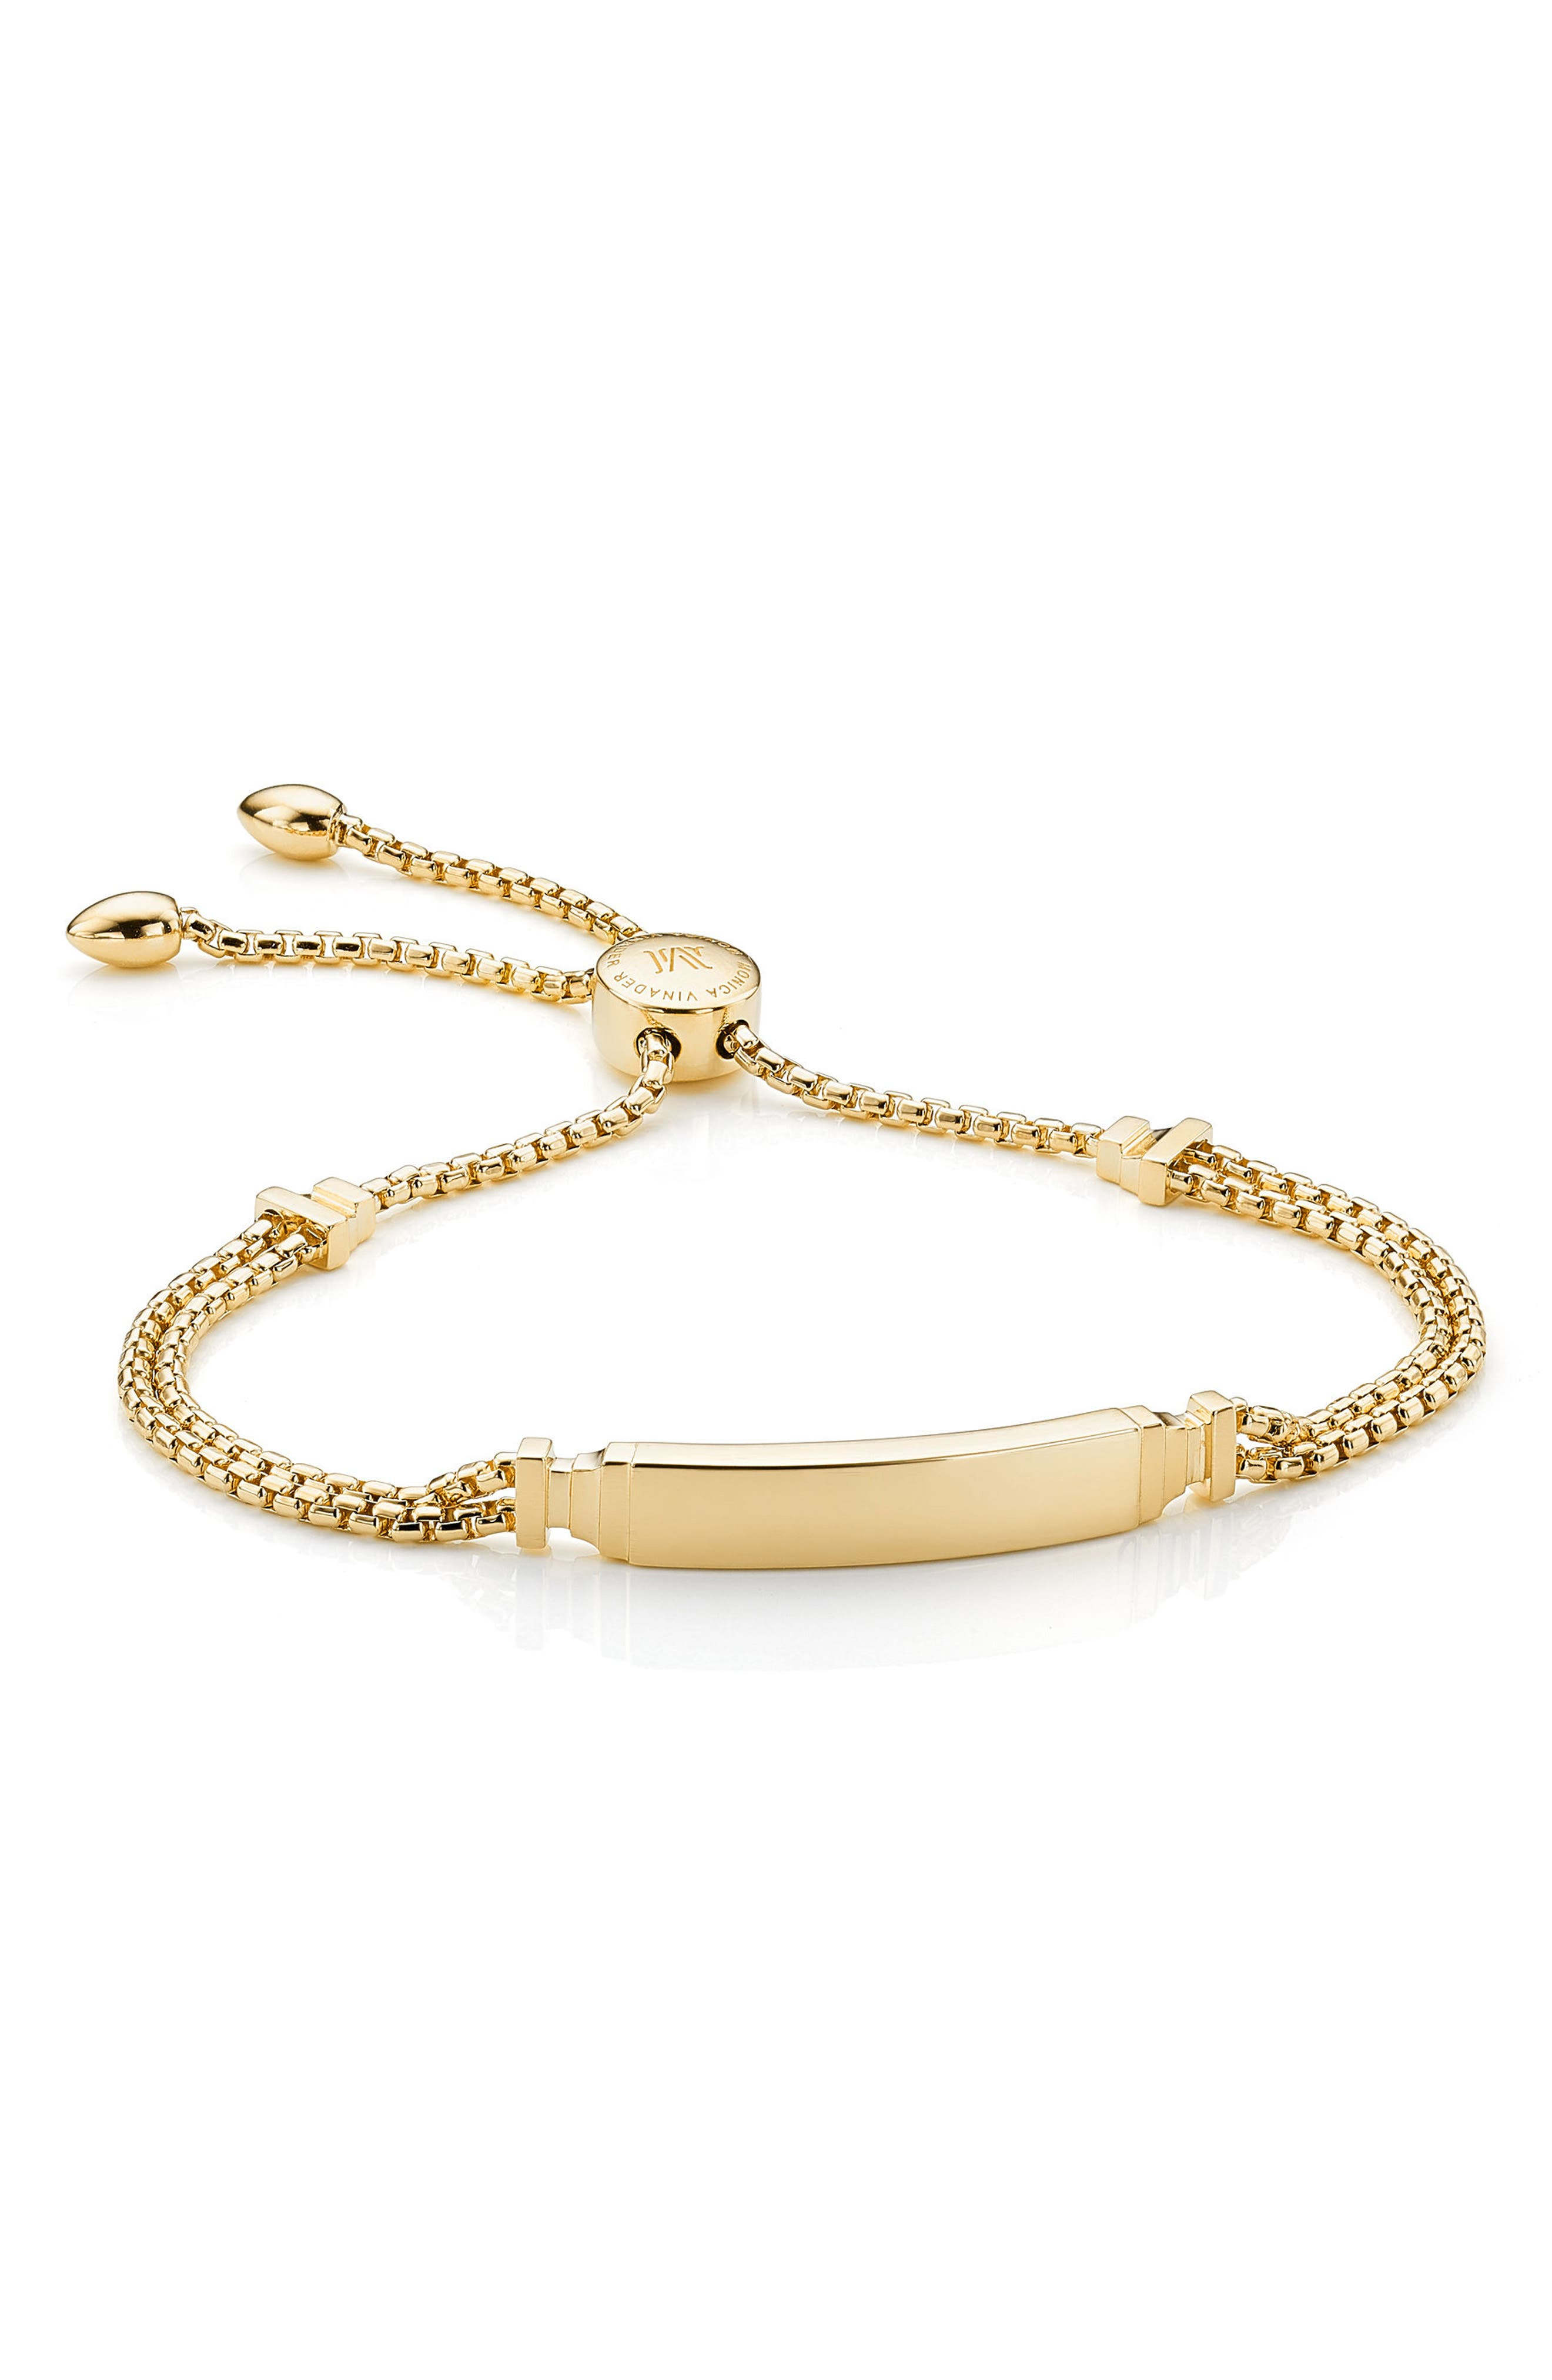 Main Image - Monica Vinader Baja Deco ID Bracelet